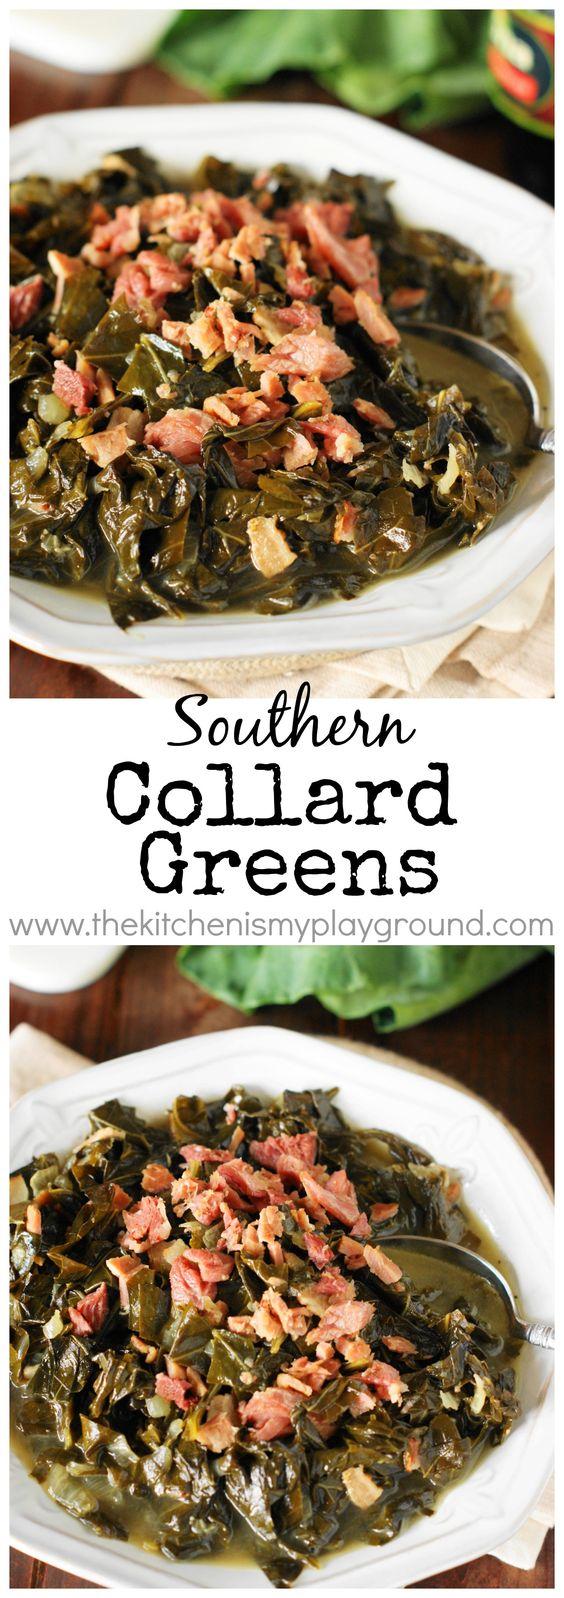 Southern Collard Greens ~ Enjoy tender, tasty collards for New Year's ...